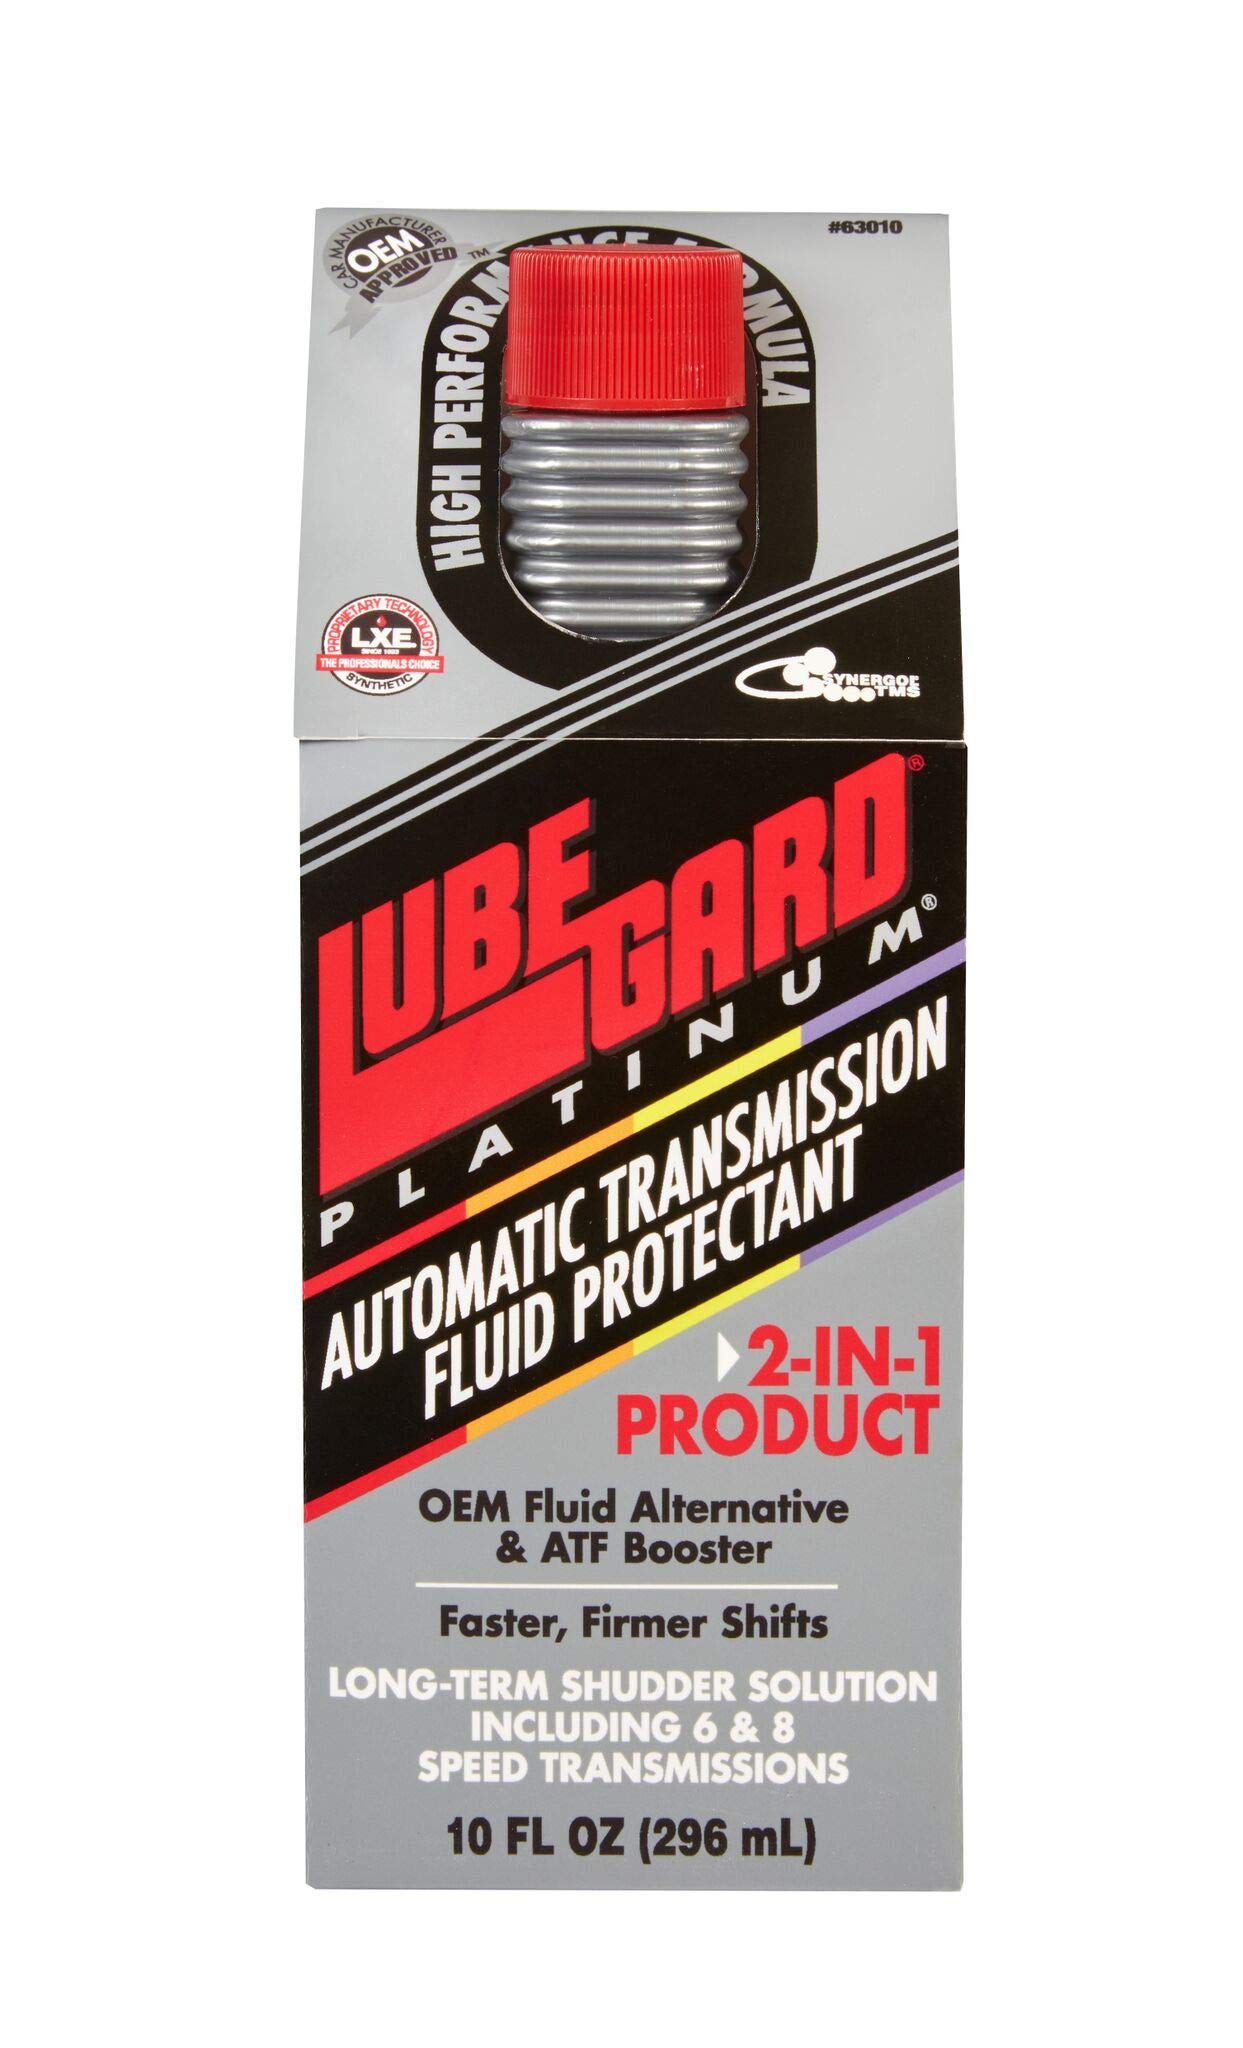 Lubegard 63010 Transmission additive, 10 oz